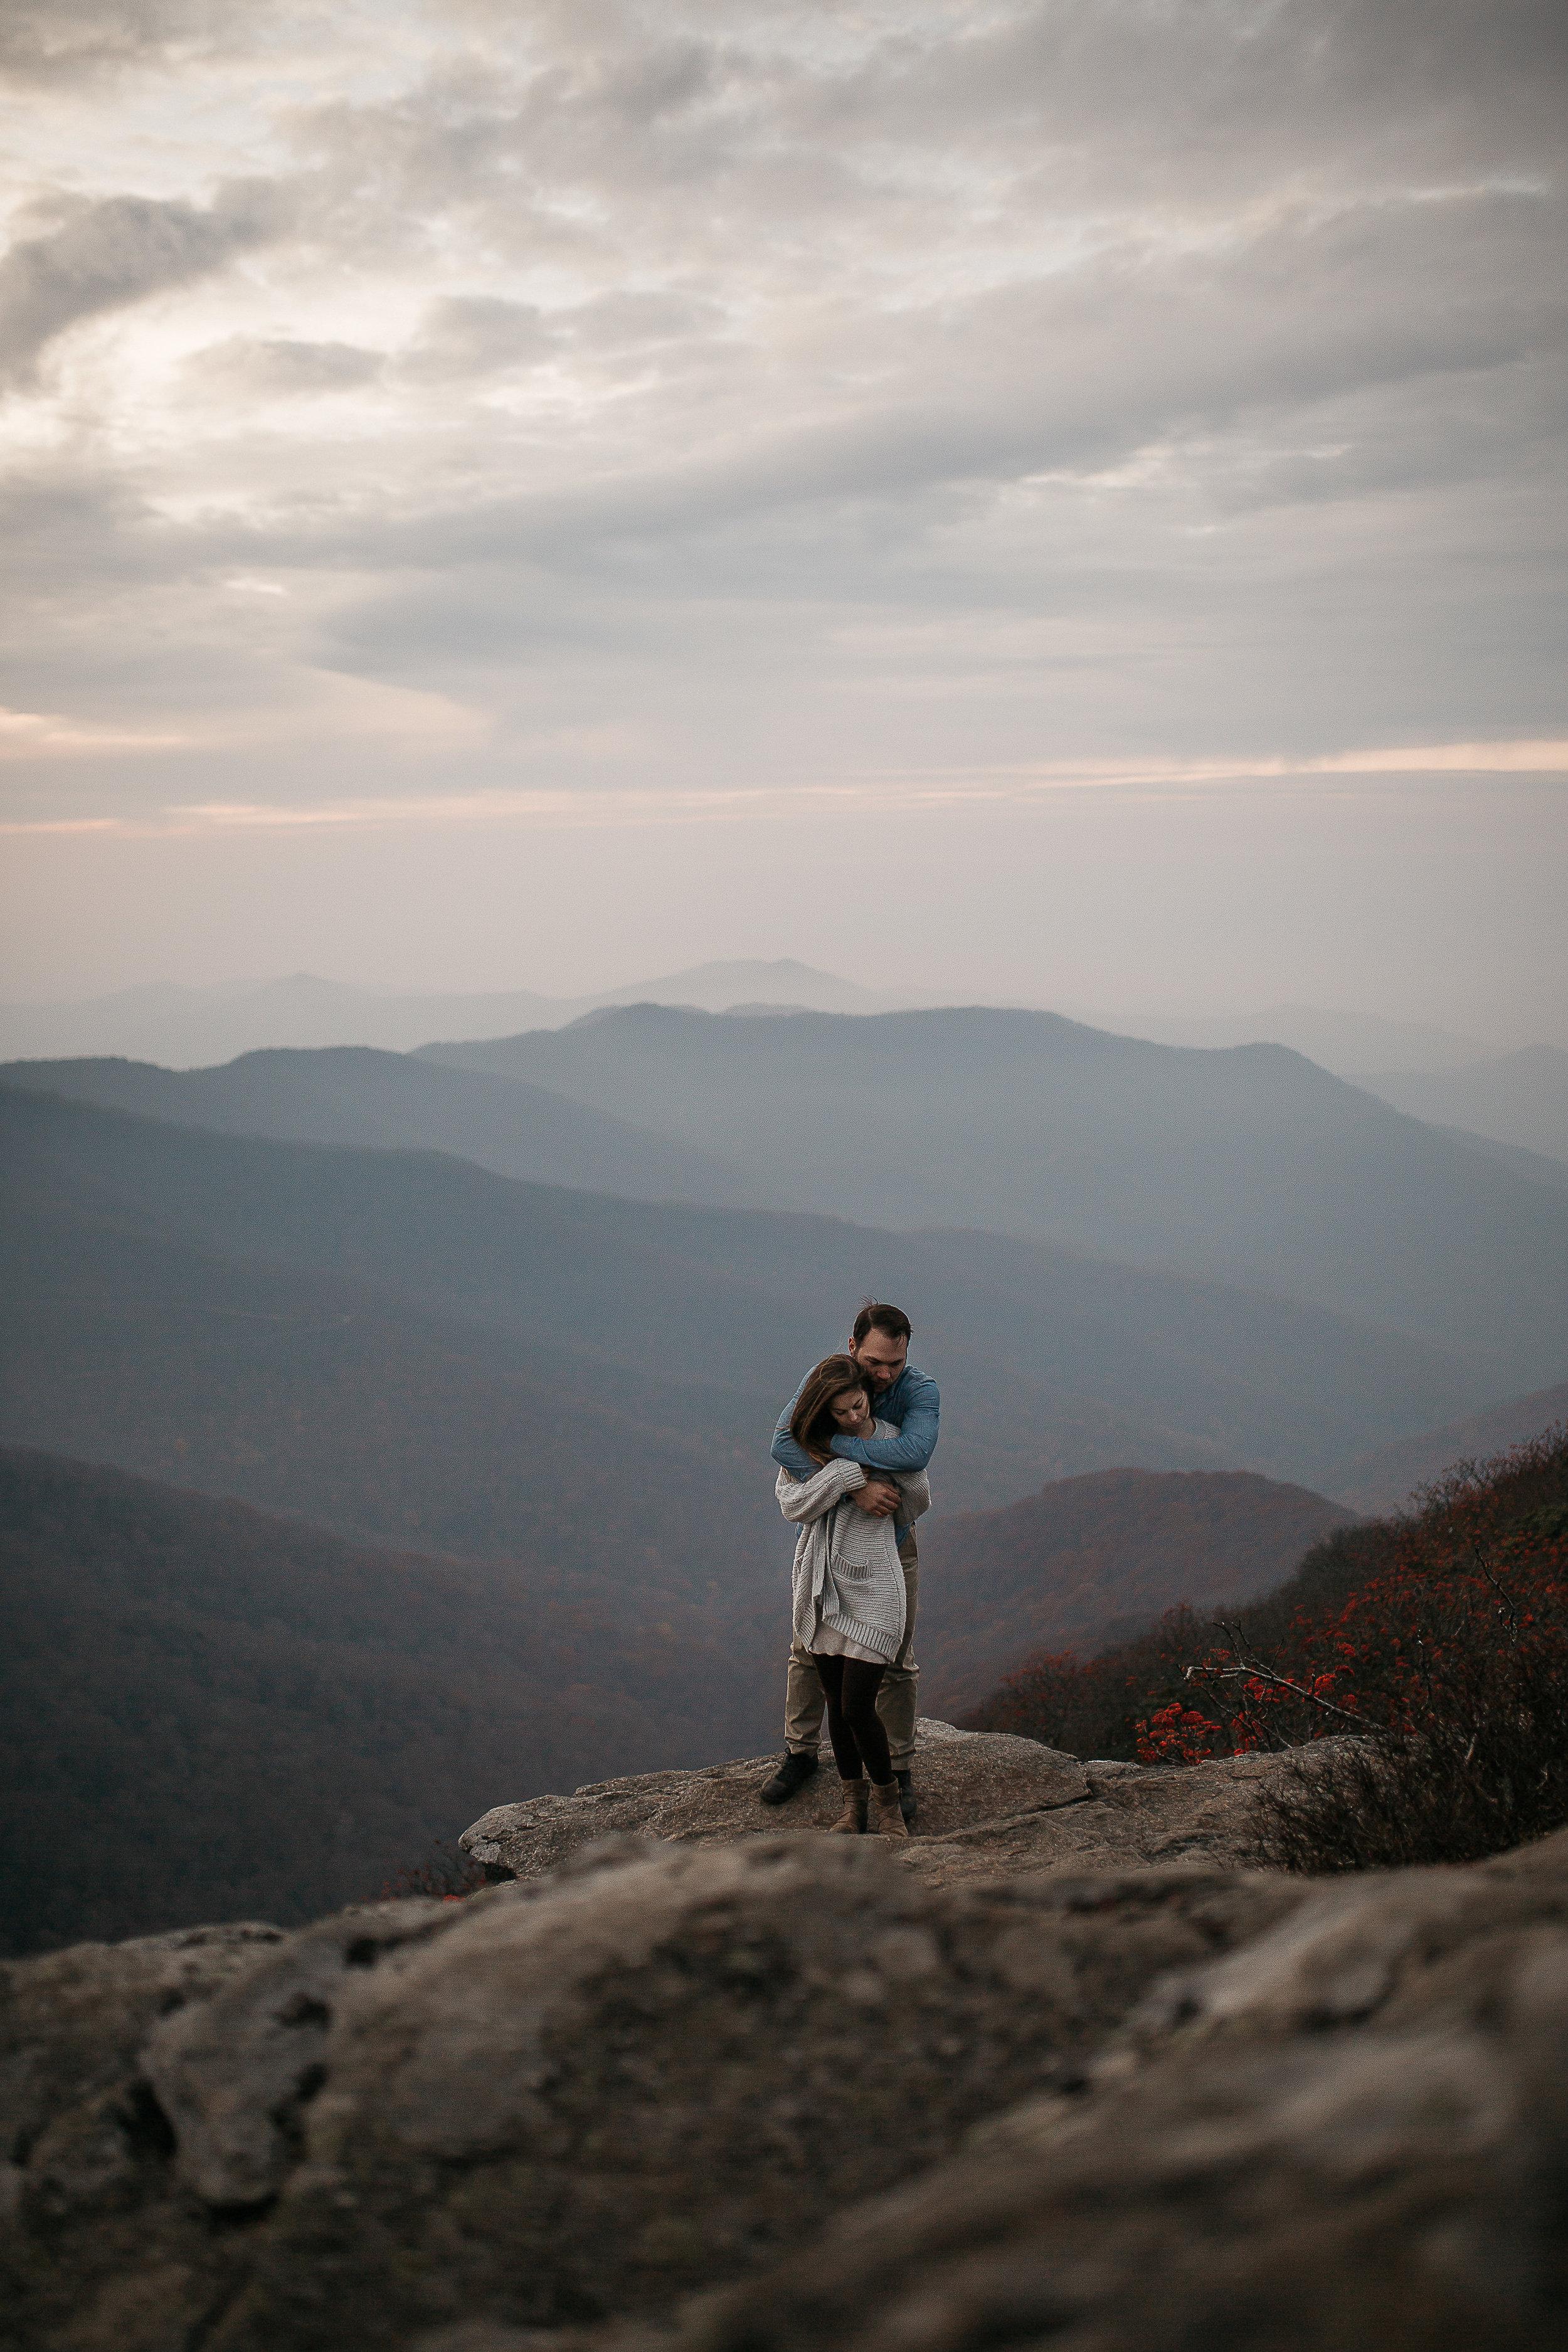 memphis-wedding-photoggrapher-portfolio-cassie-cook-photography-49.jpg